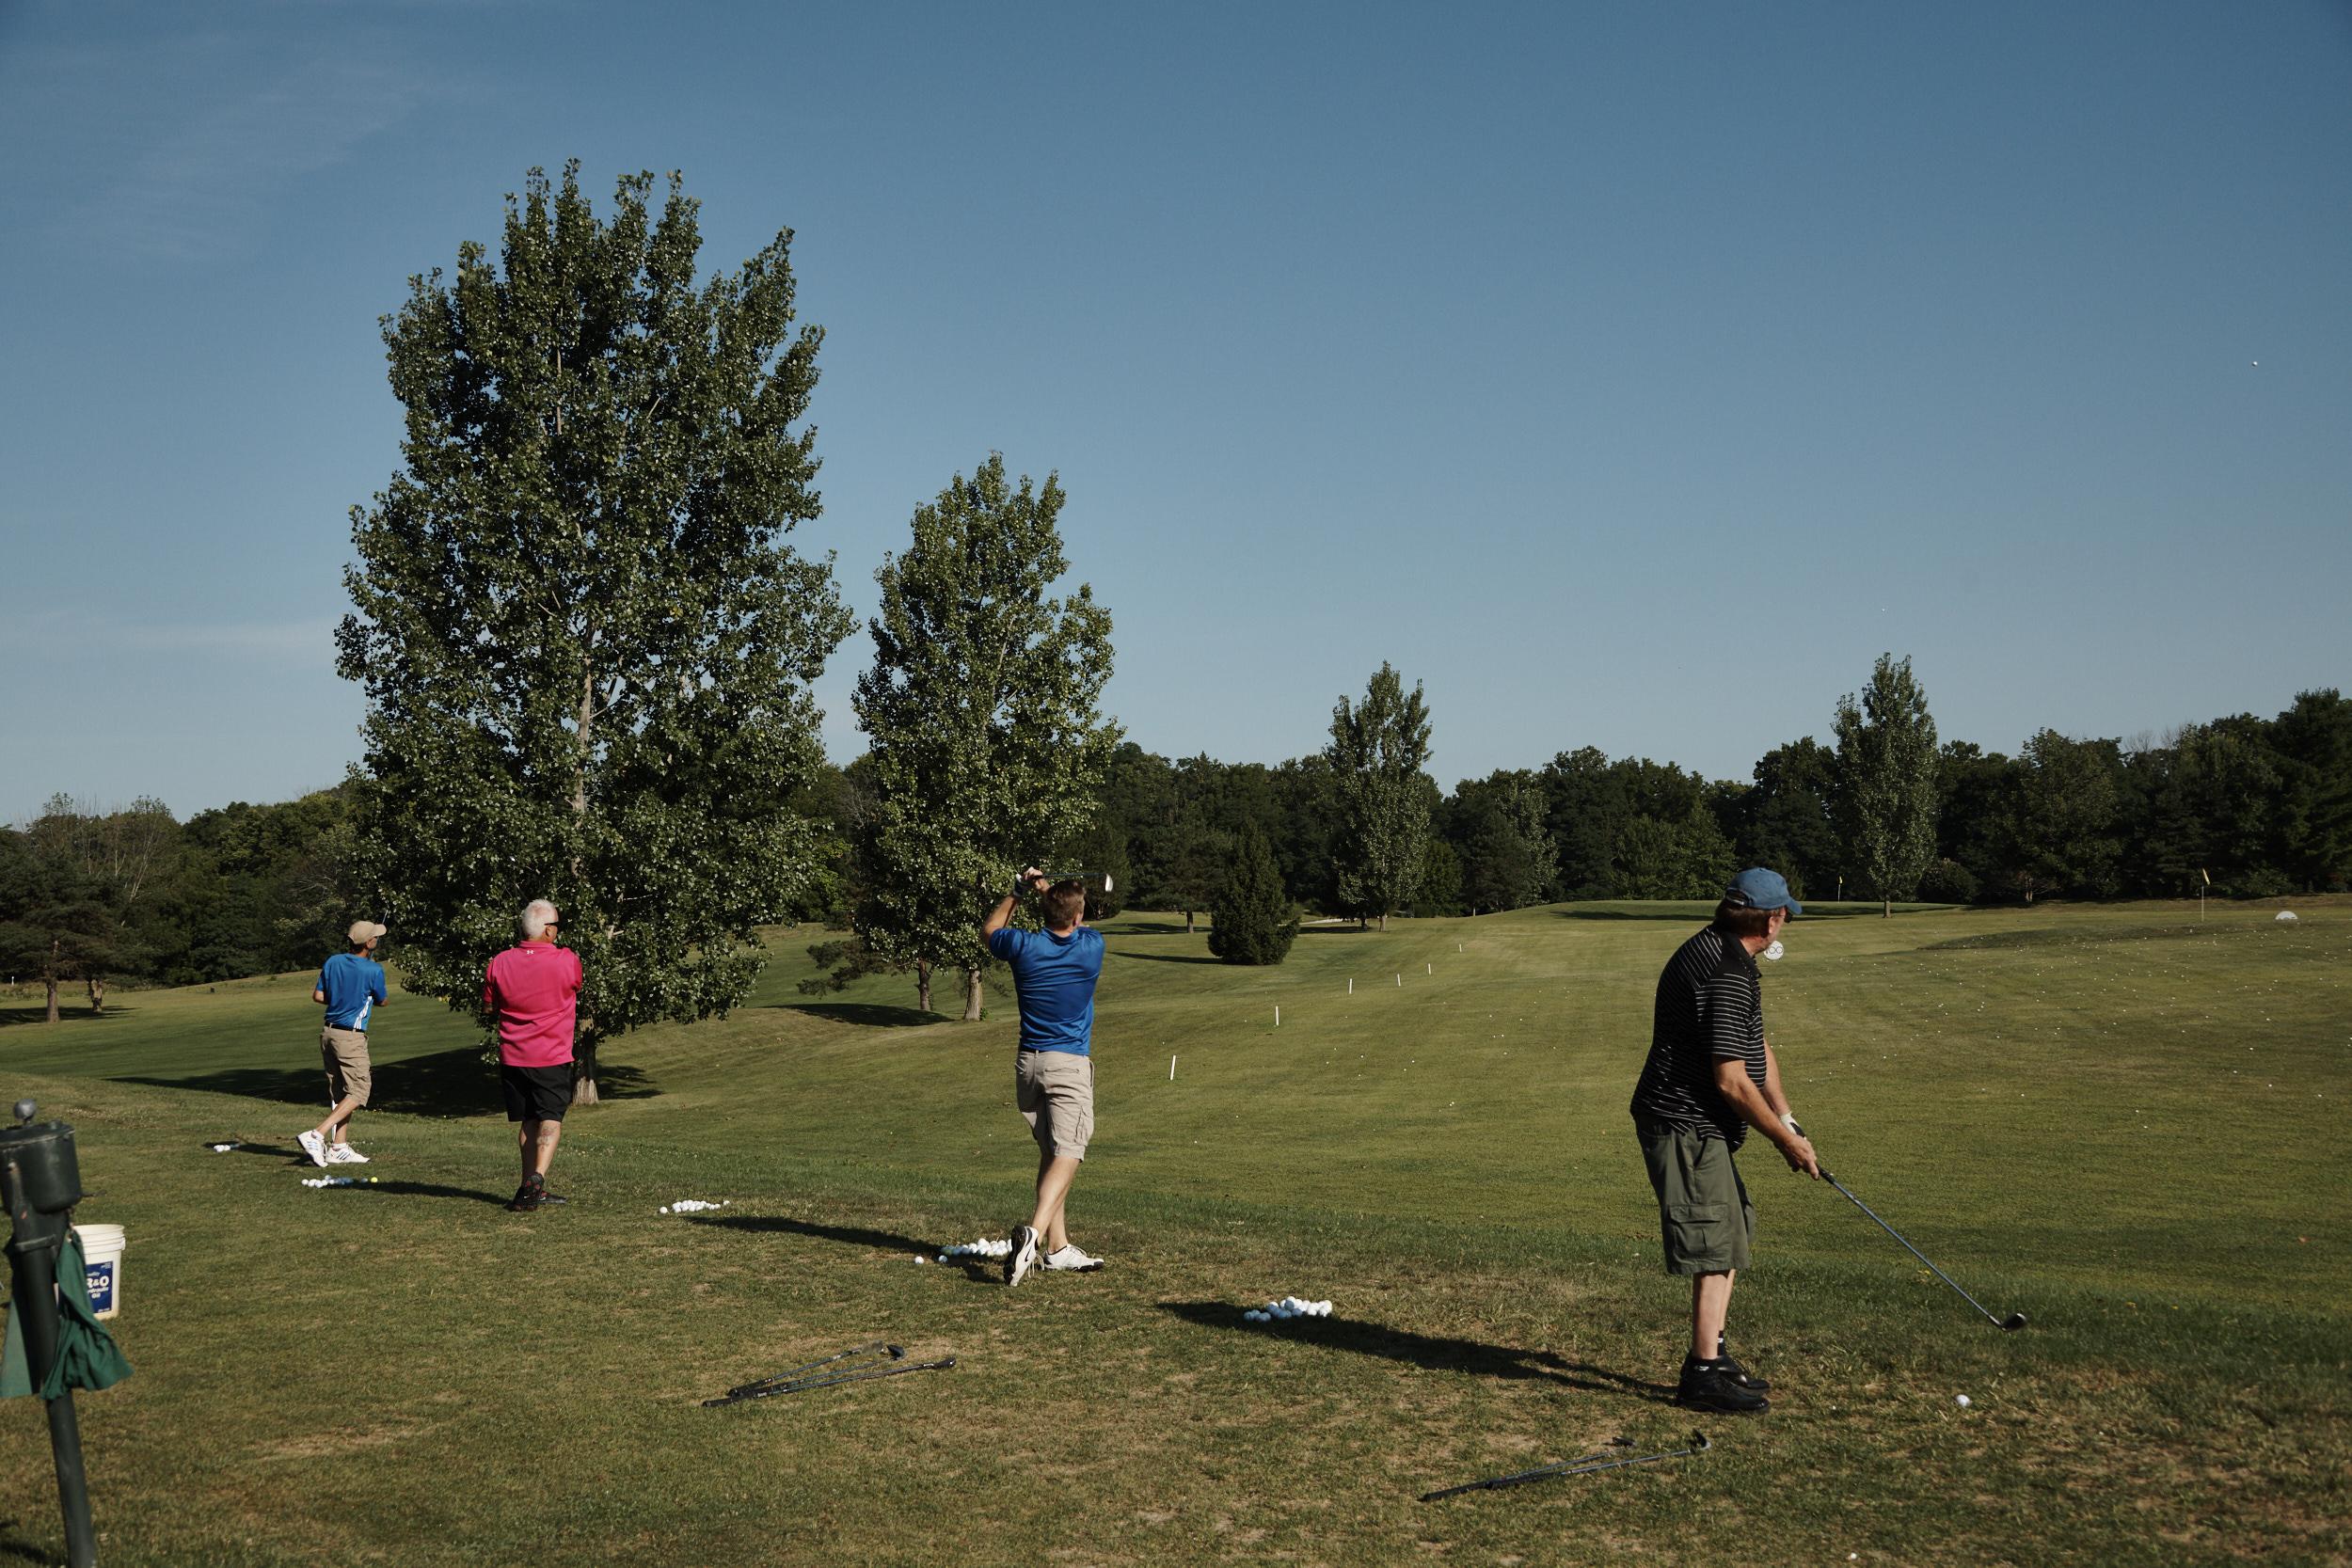 20180728 MTM Golf Outing - Tim Schumm Photography 004.jpg